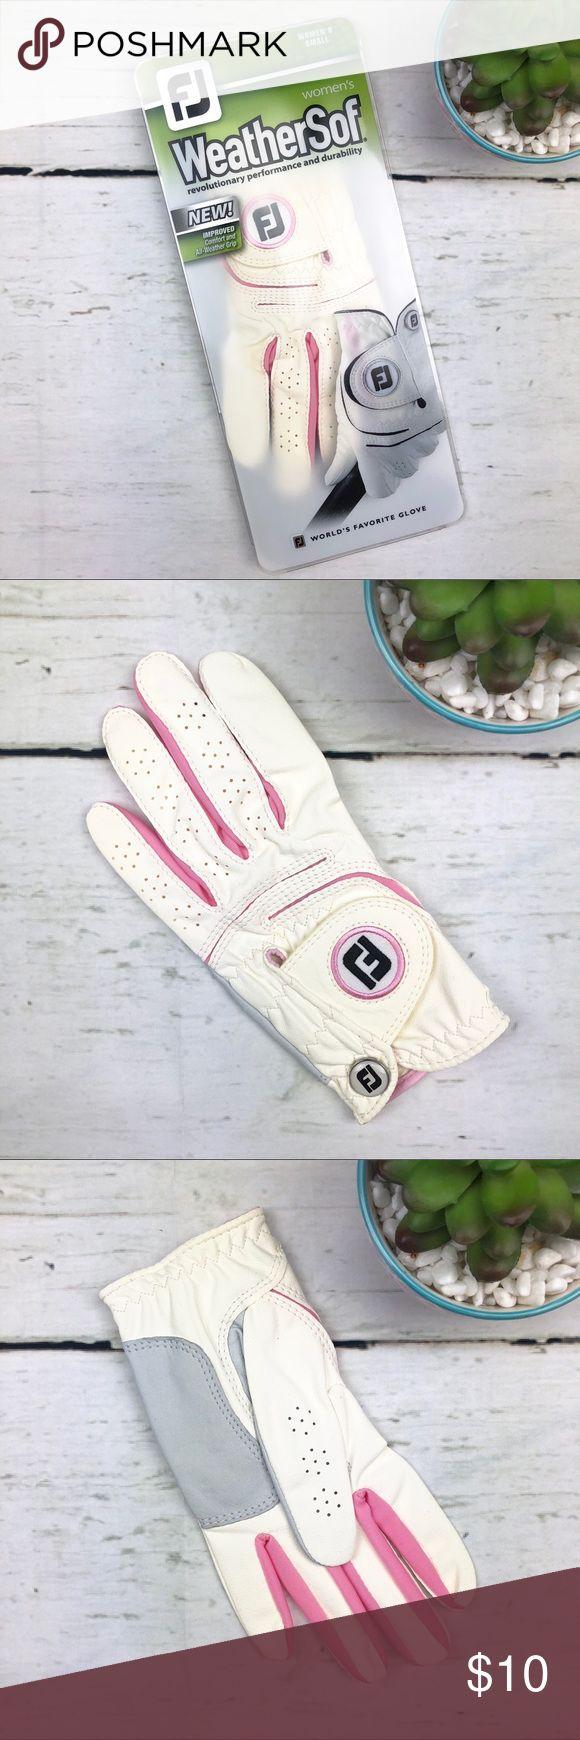 Fj Weathersof Women S Golf Glove Footjoy Weathersof Women S Golf Glove Size S Never Worn New In Packaging Footjoy Other Golf Gloves Gloves Women